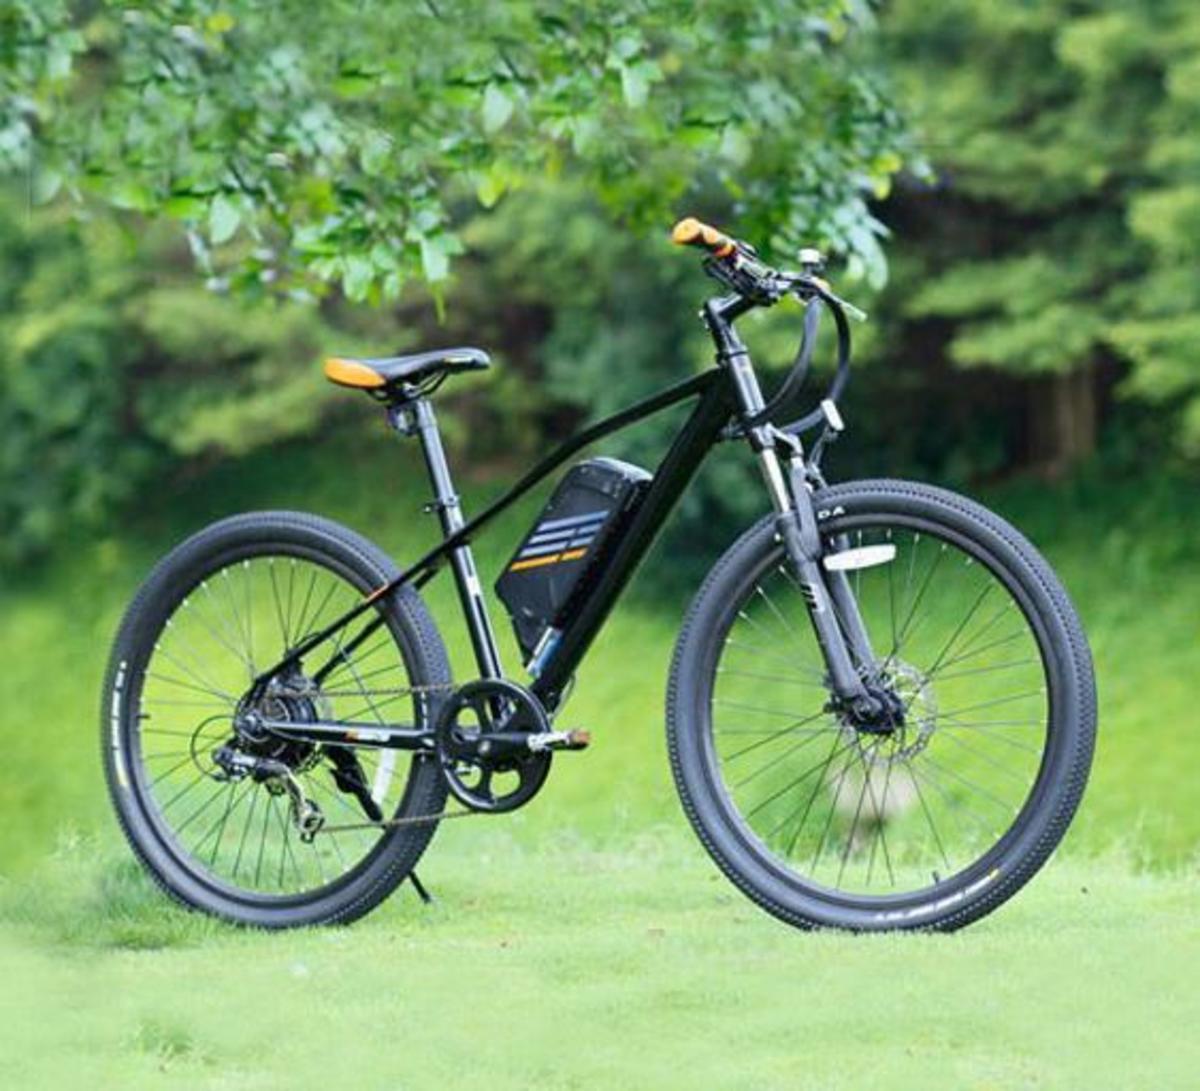 Bild 5 von SachsenRad E-Racing Bike R6